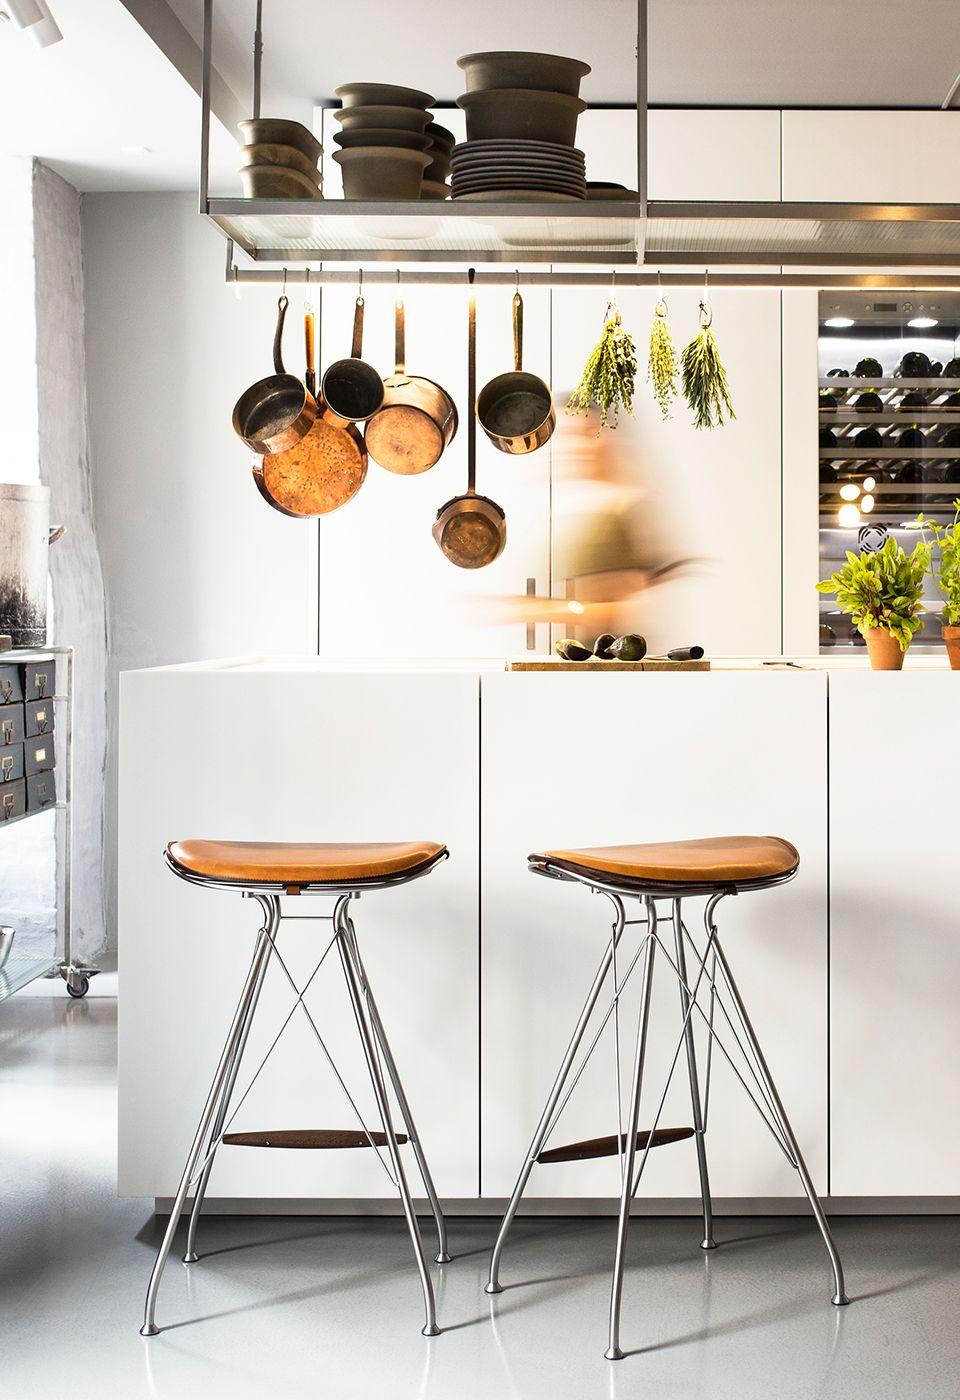 Boffi kitchen space overgaard dyrman bar stools